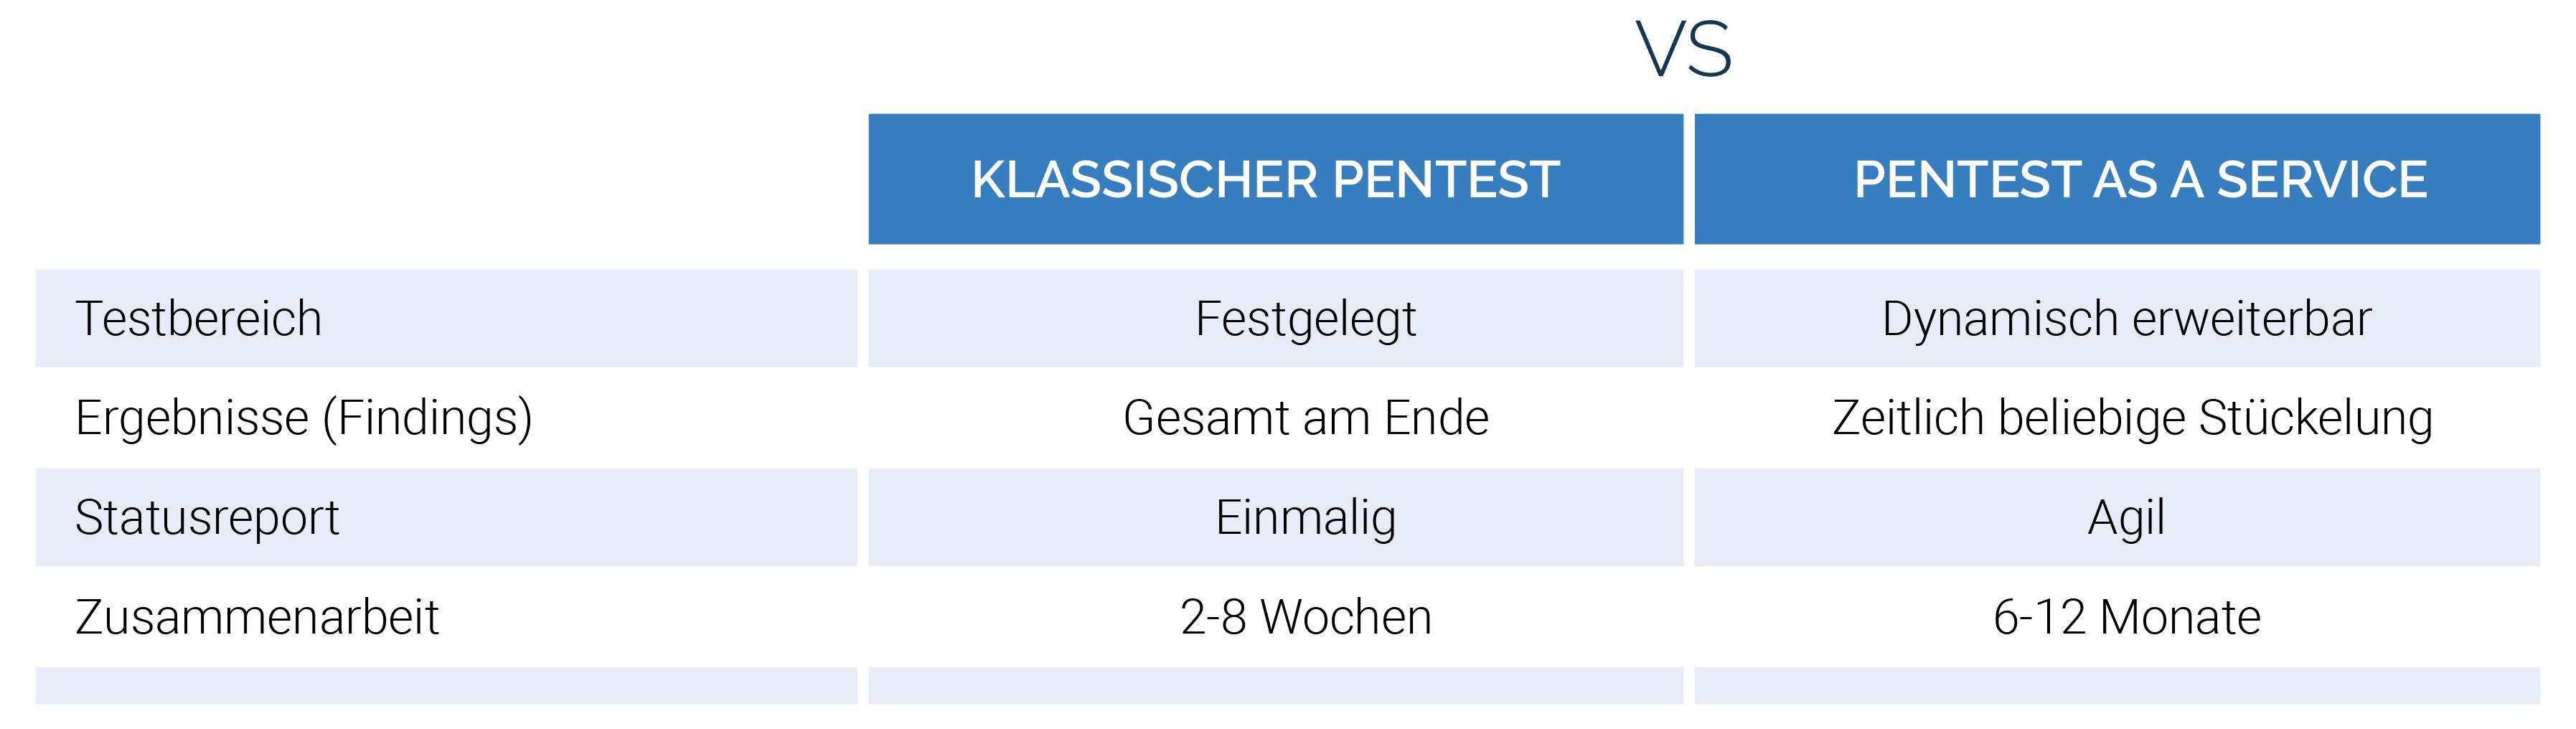 Klassischer Pentest Vs. Pentest as a Service